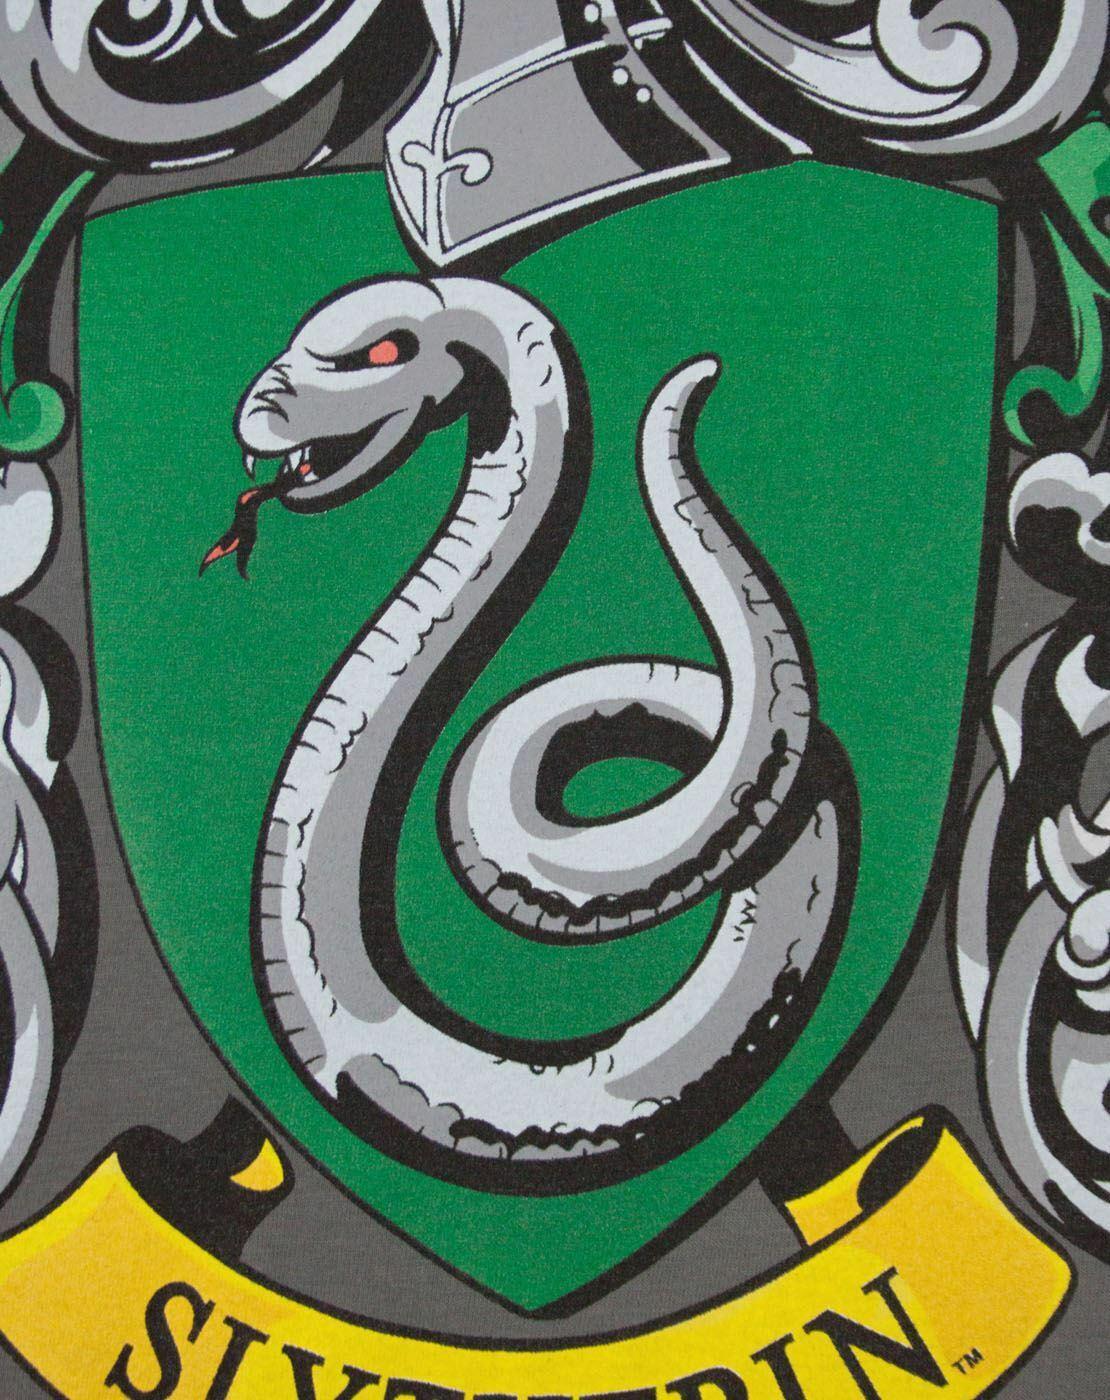 Harry-Potter-Slytherin-Crest-Women-039-s-T-Shirt-and-Mug-Gift-Set-Bundle thumbnail 10